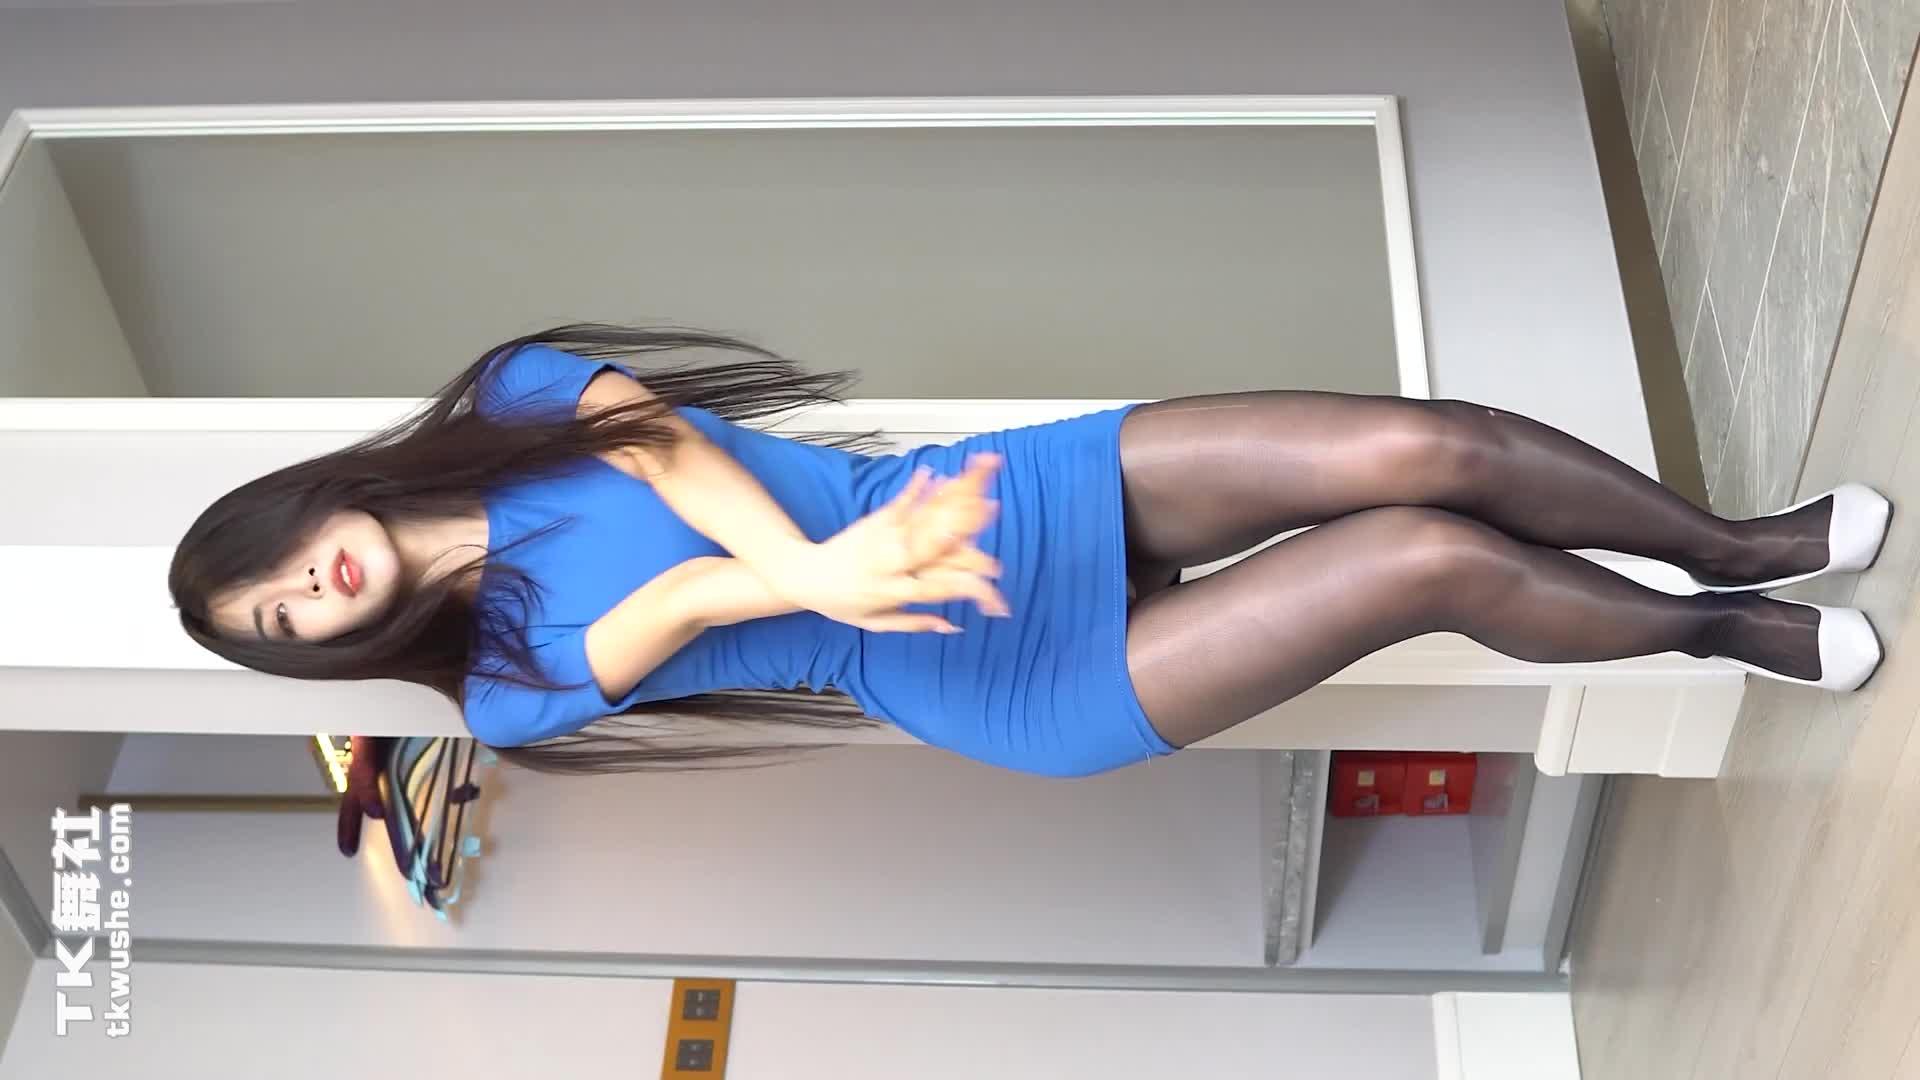 tk舞社 雯雯4k性感热舞 sexy dance